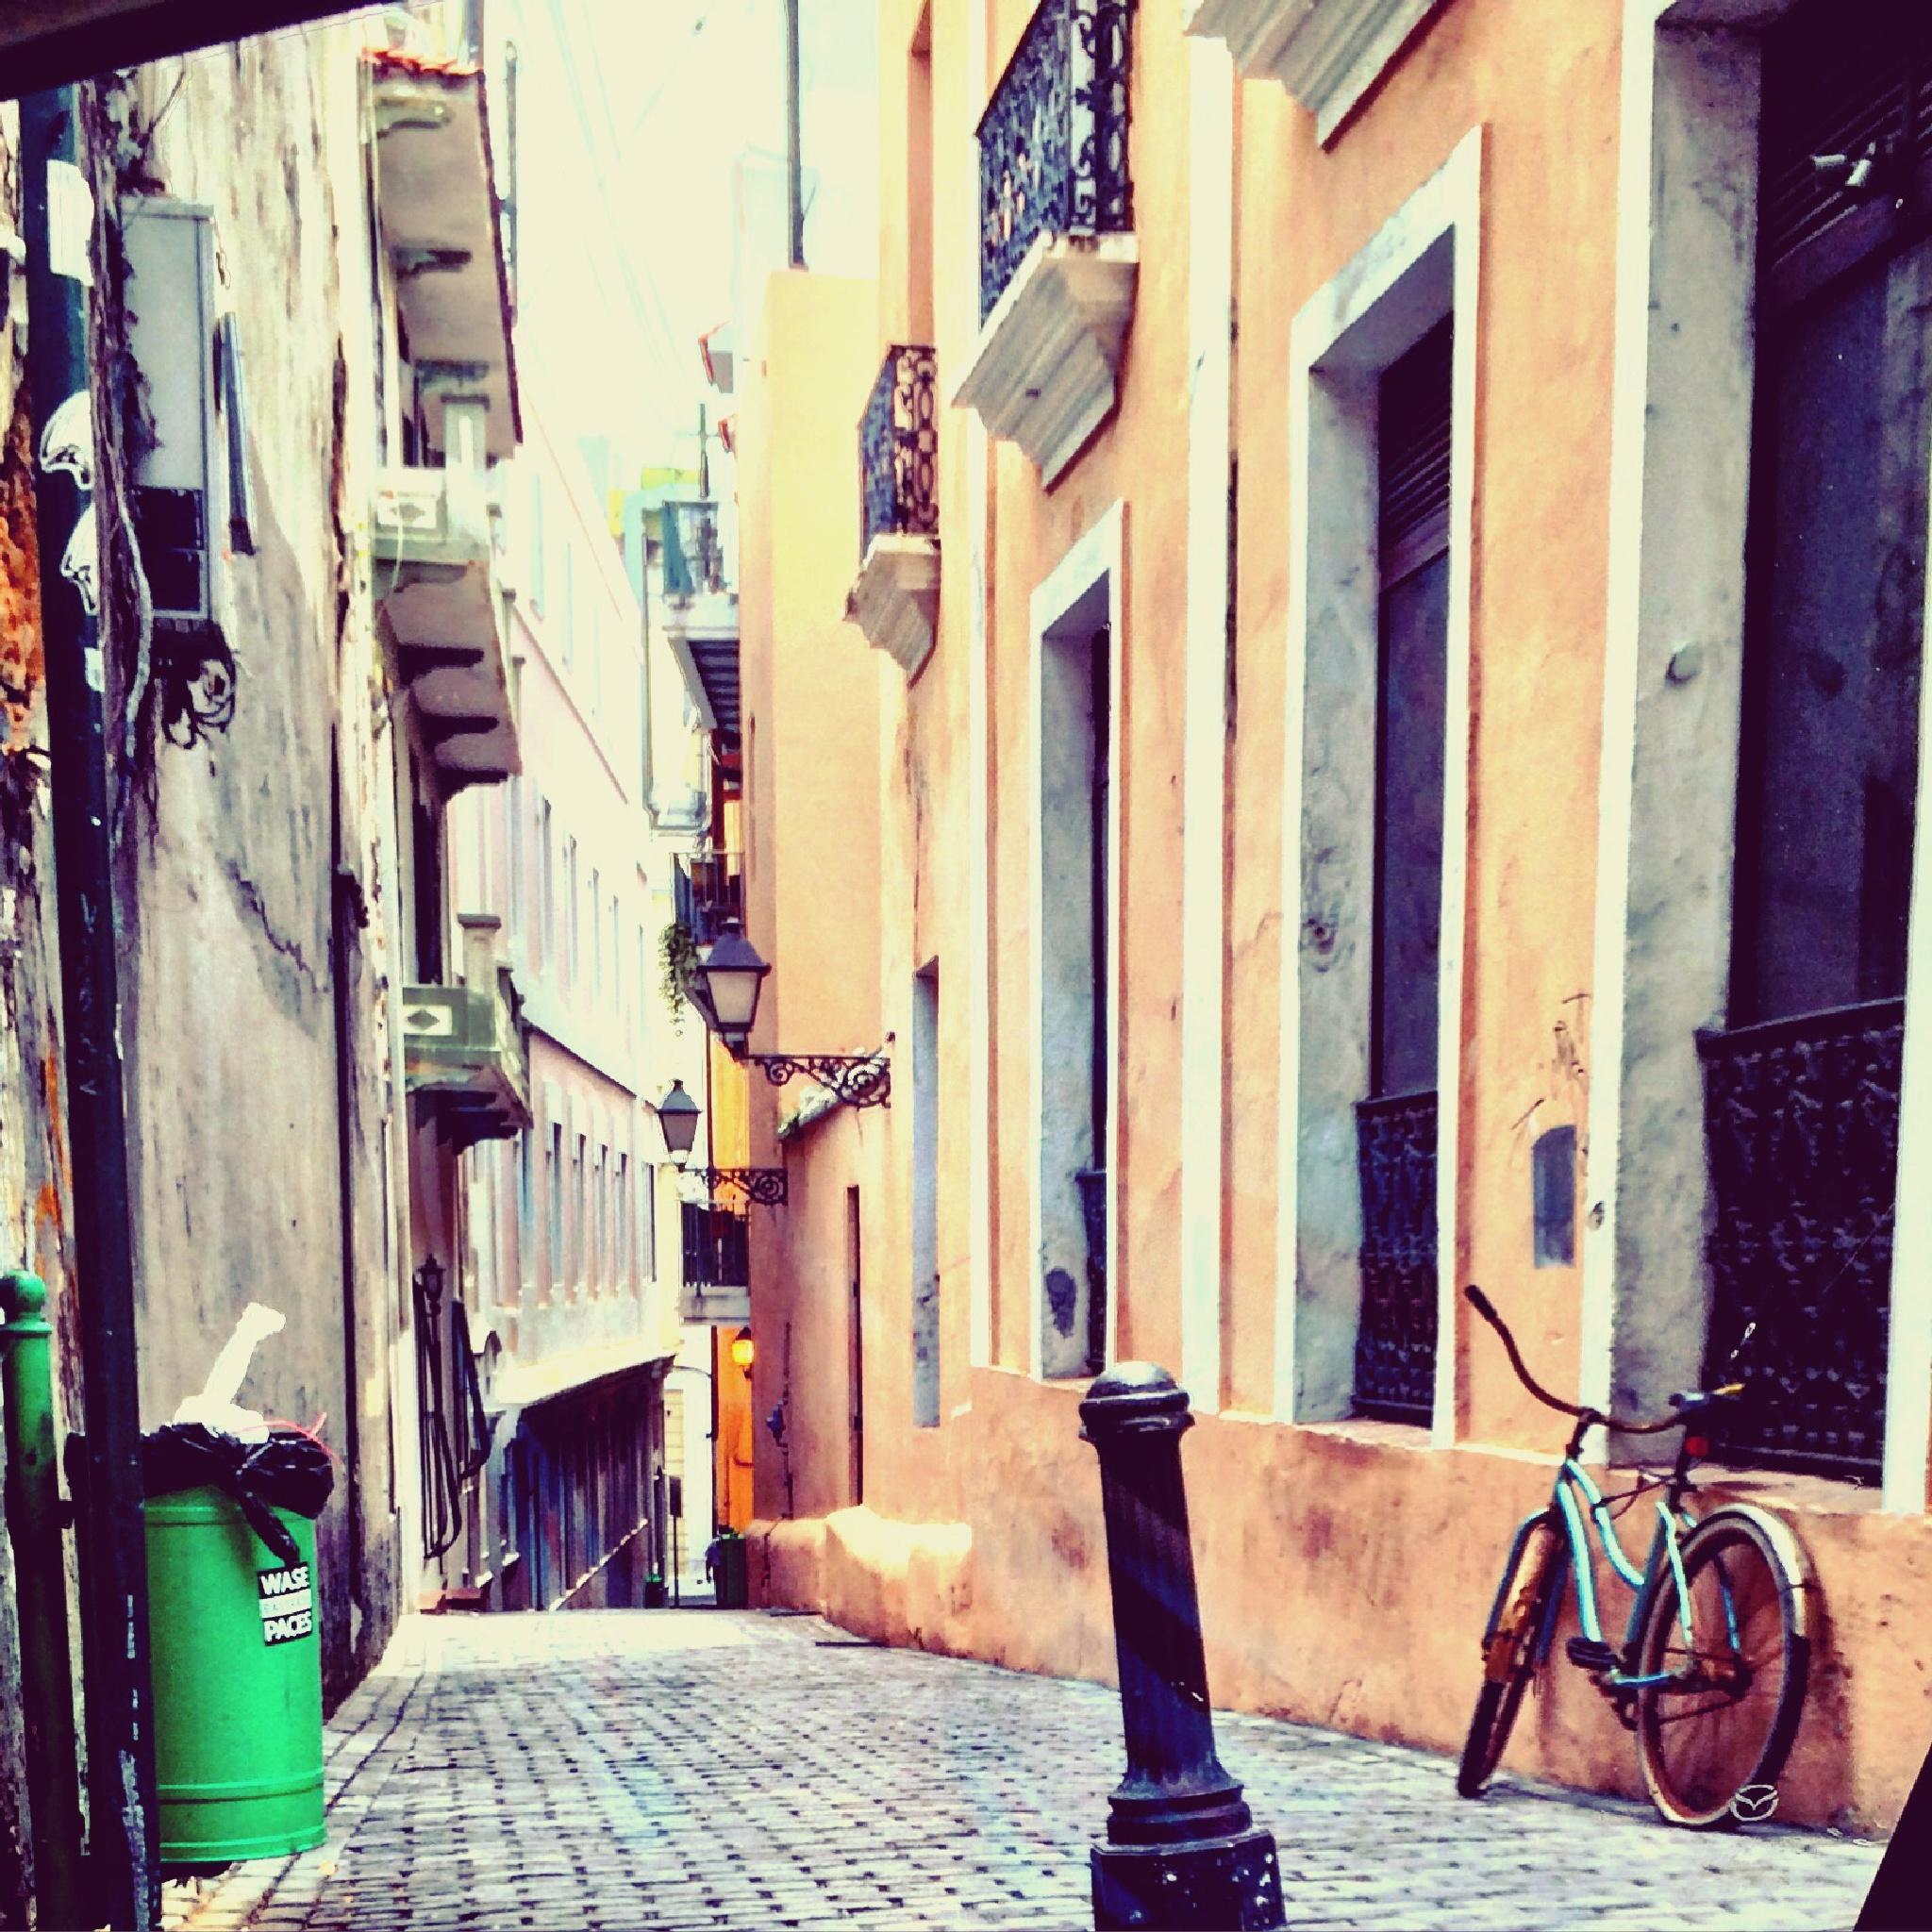 Alleyway  by Nilda64pr